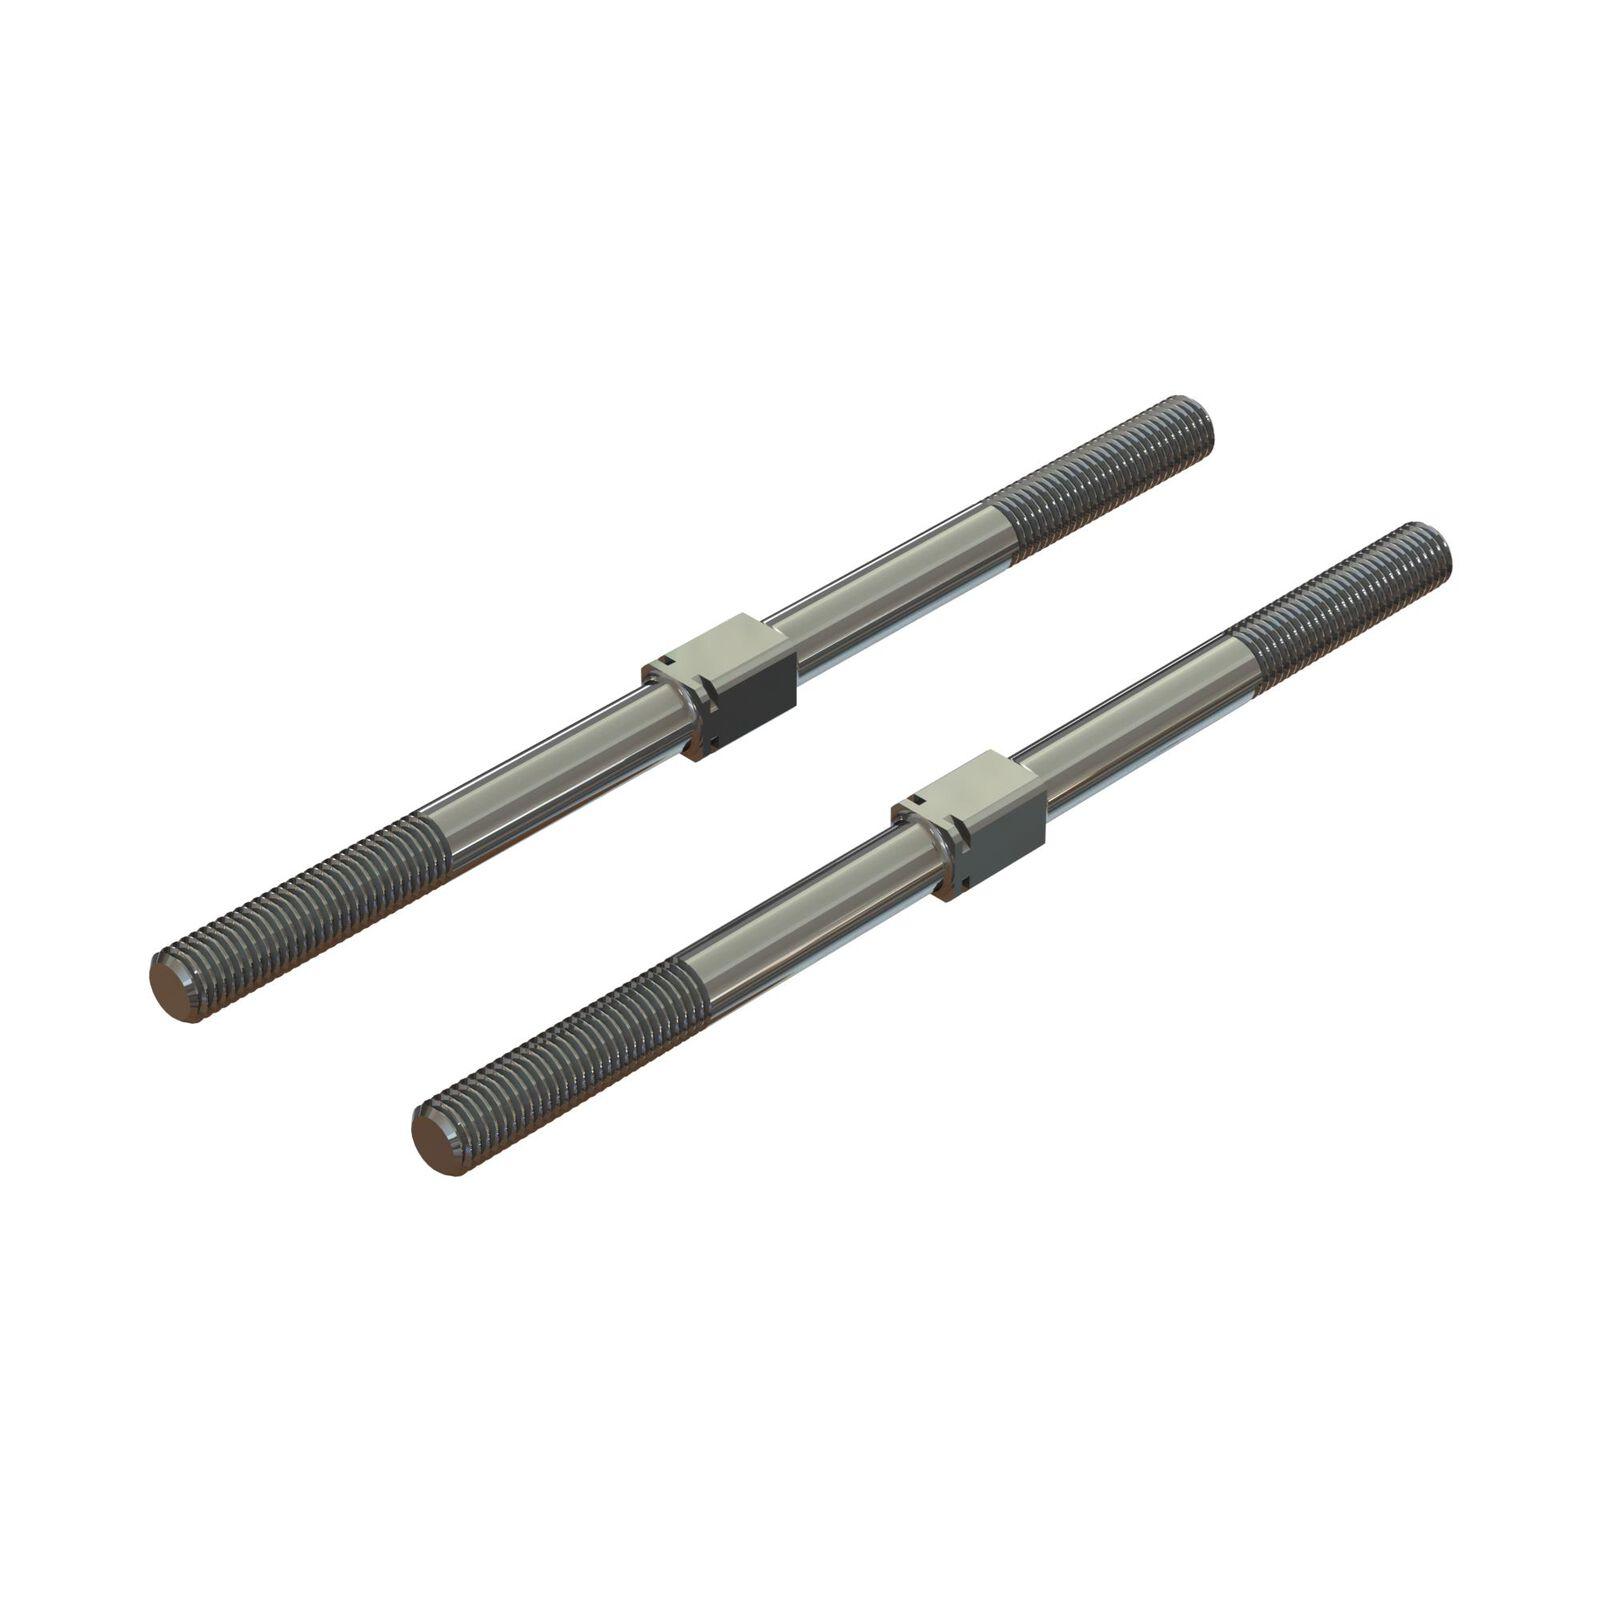 Steel Turnbuckle M7x130mm Silver (2)